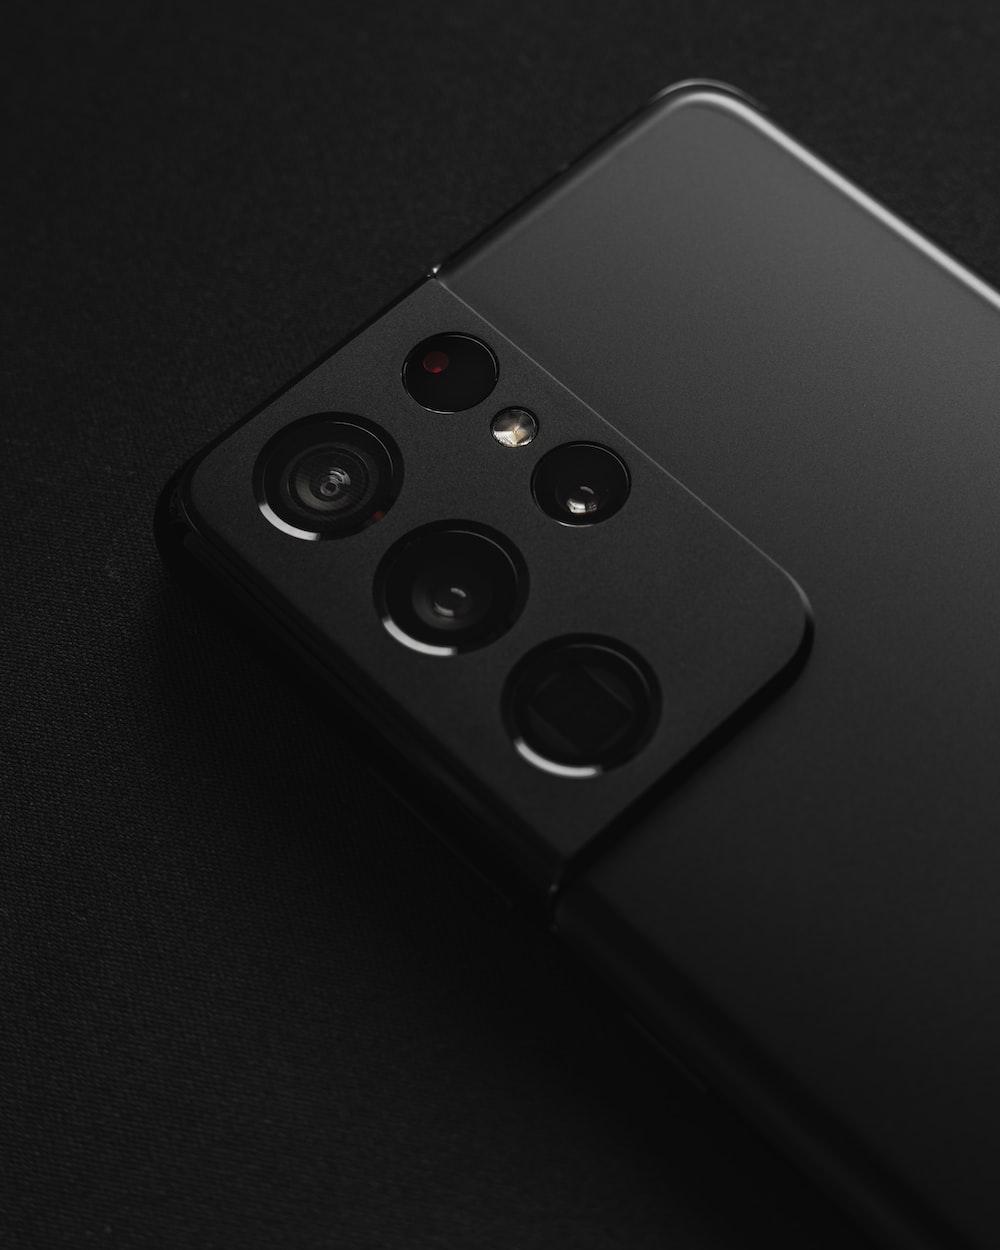 black remote control on black textile